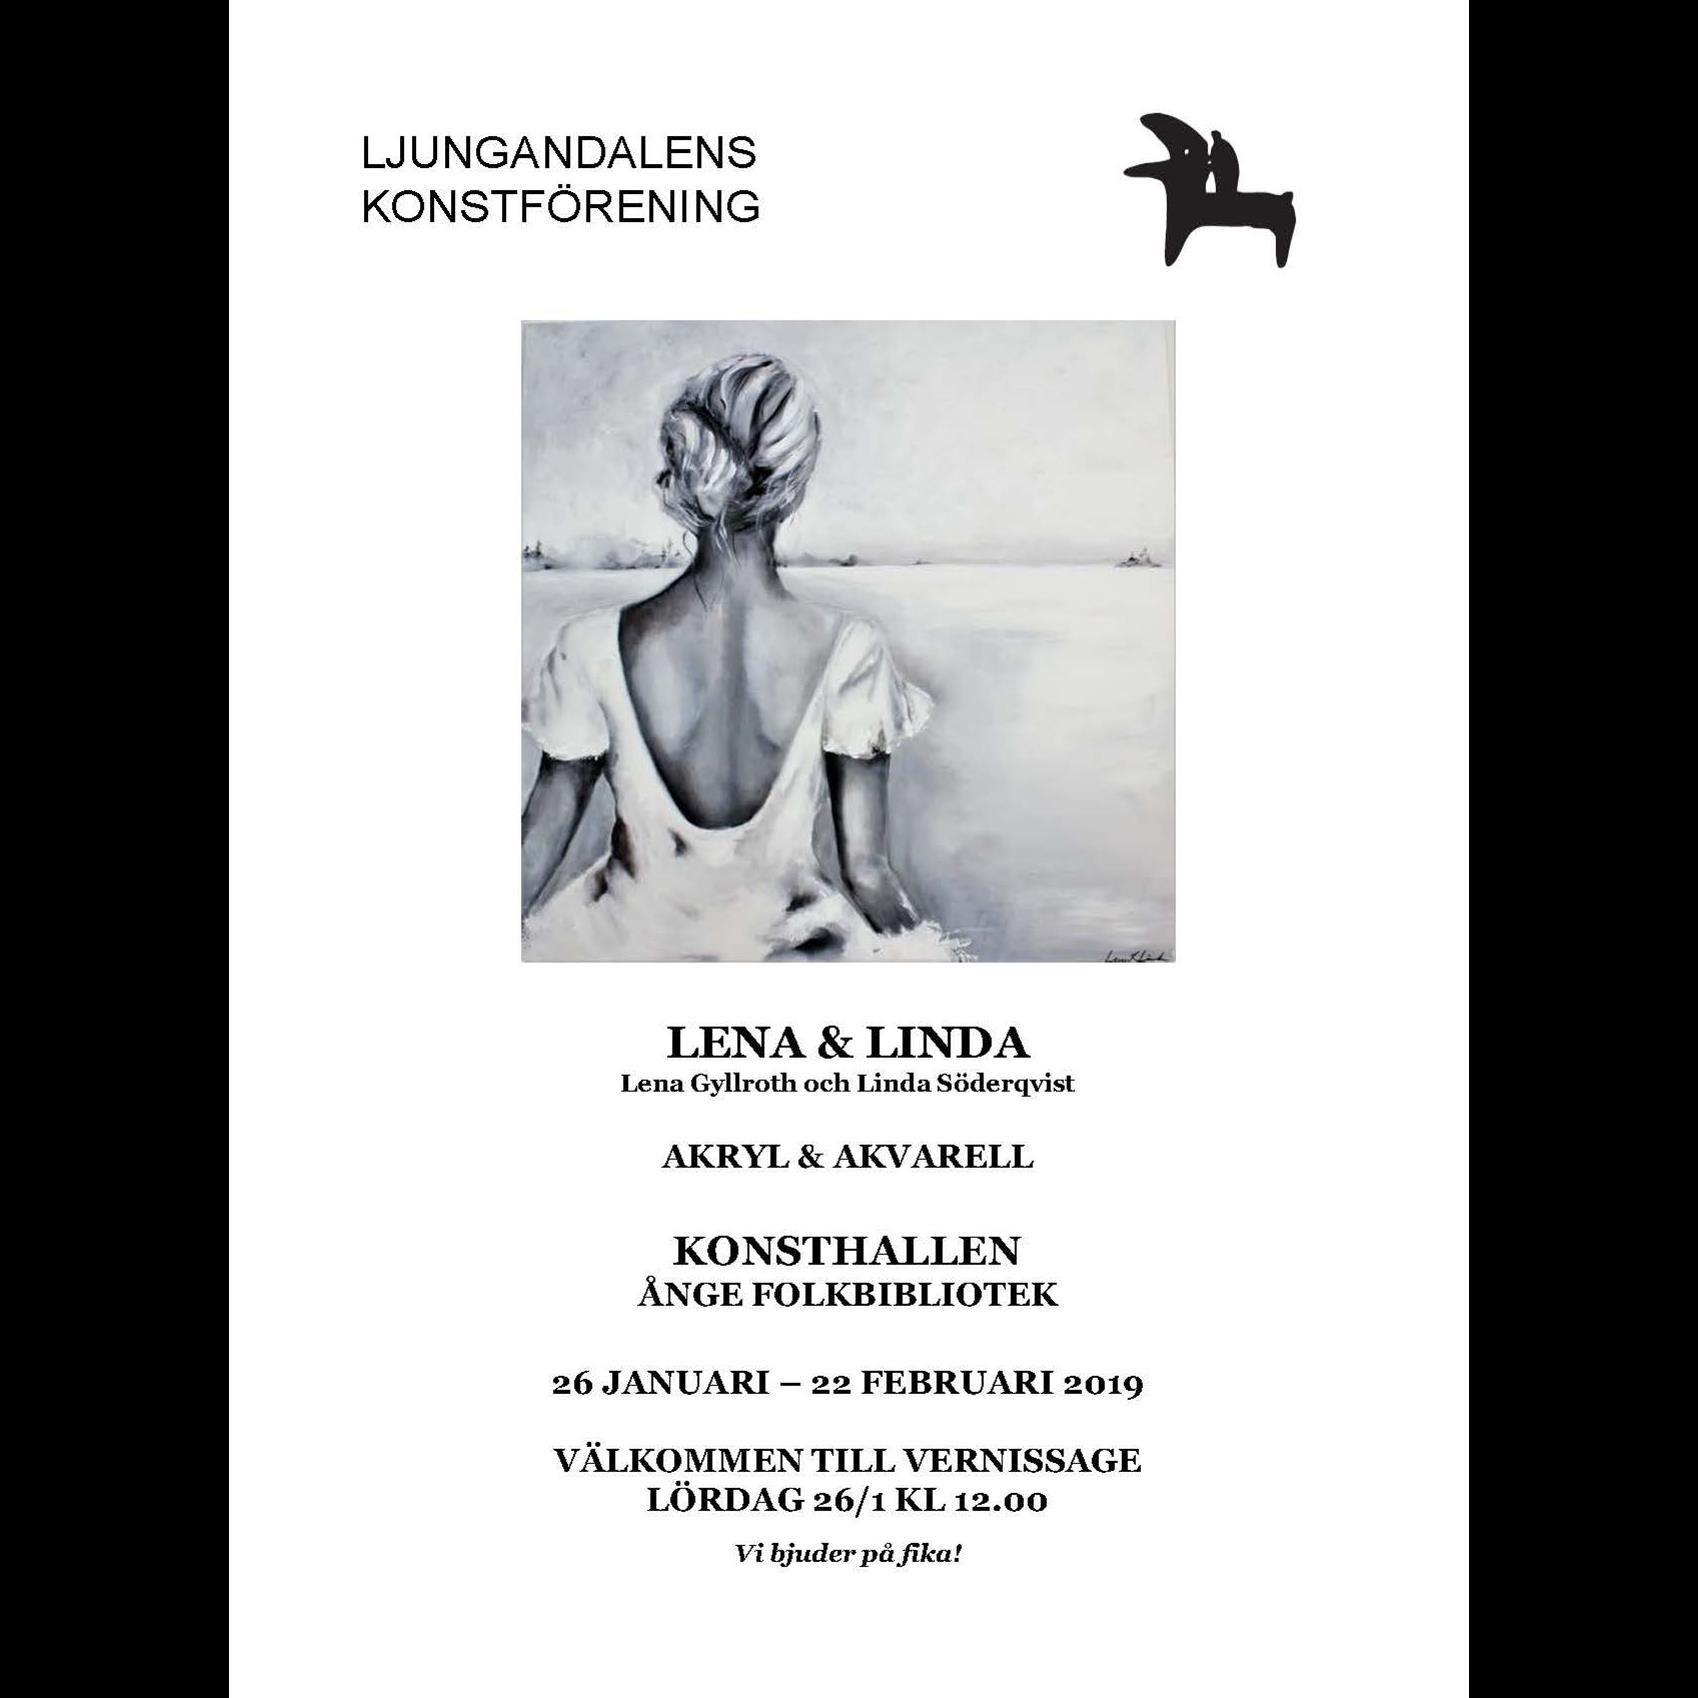 Lena&Linda Art,  © Ljungandalens konstförening, Lena&Linda Art